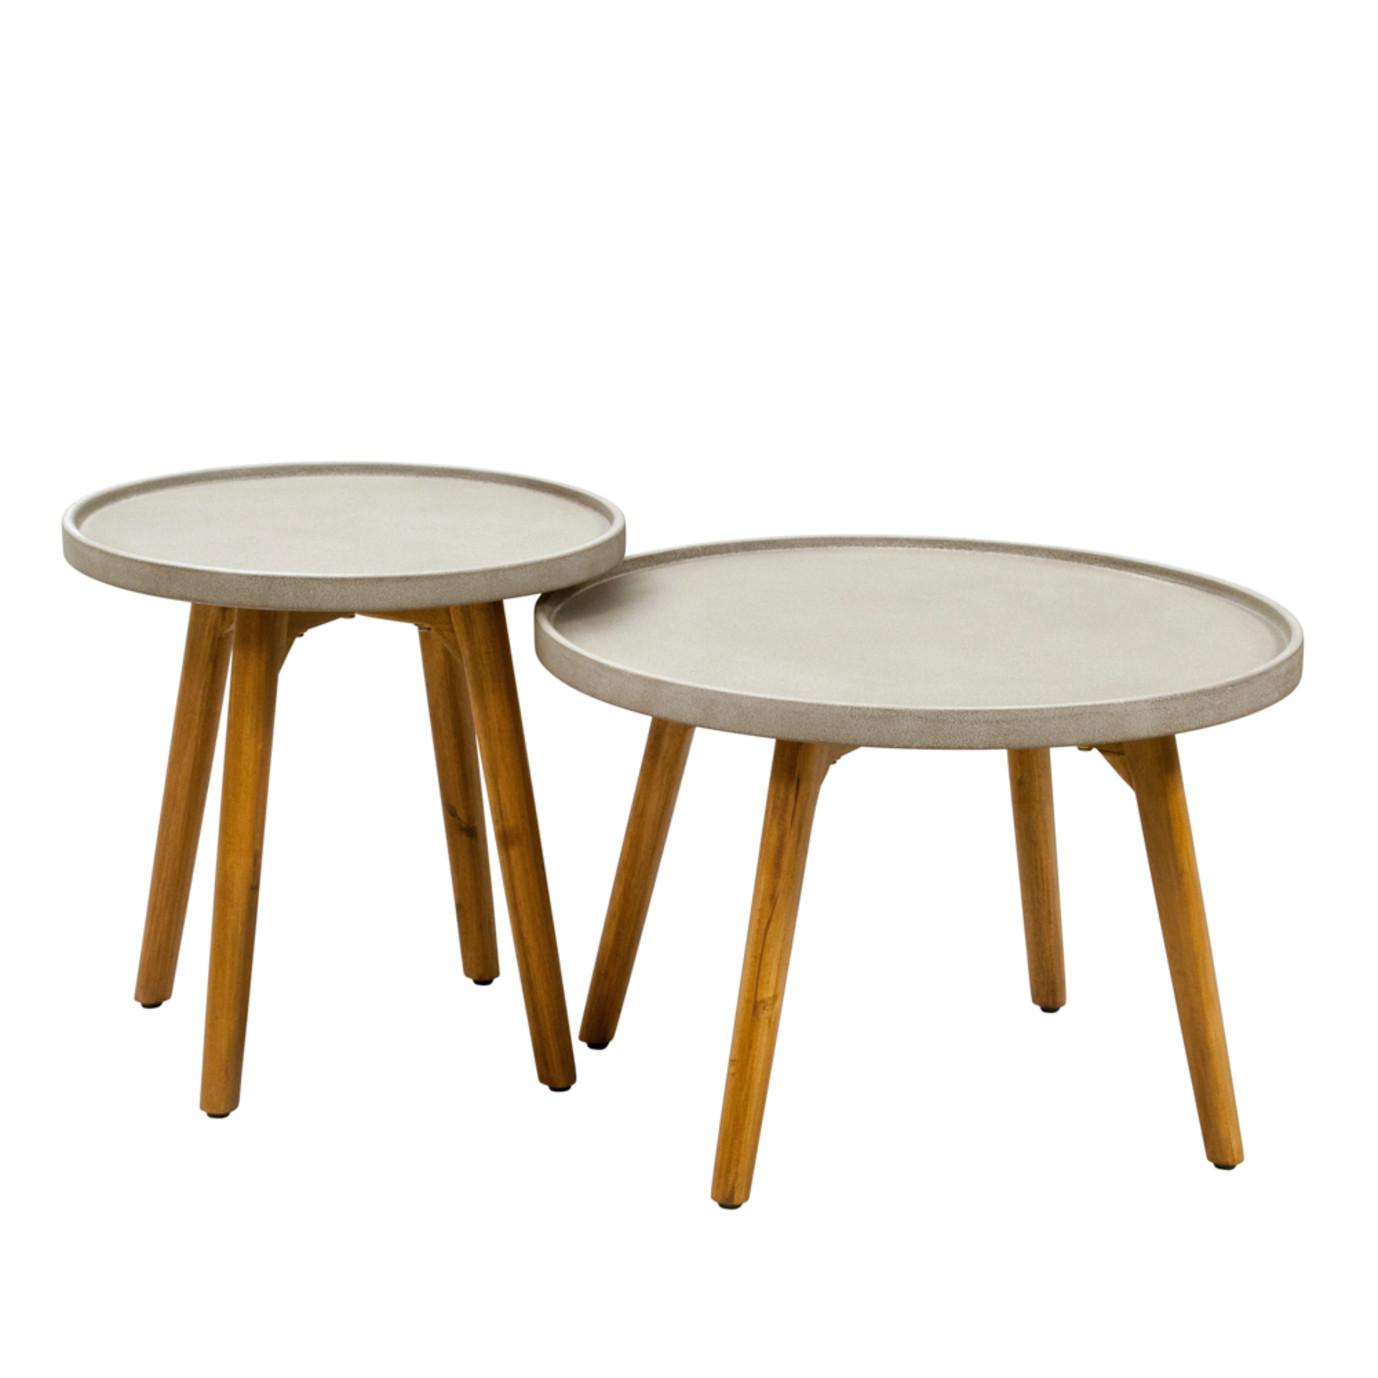 Savea 5pc Seating Set - Gray